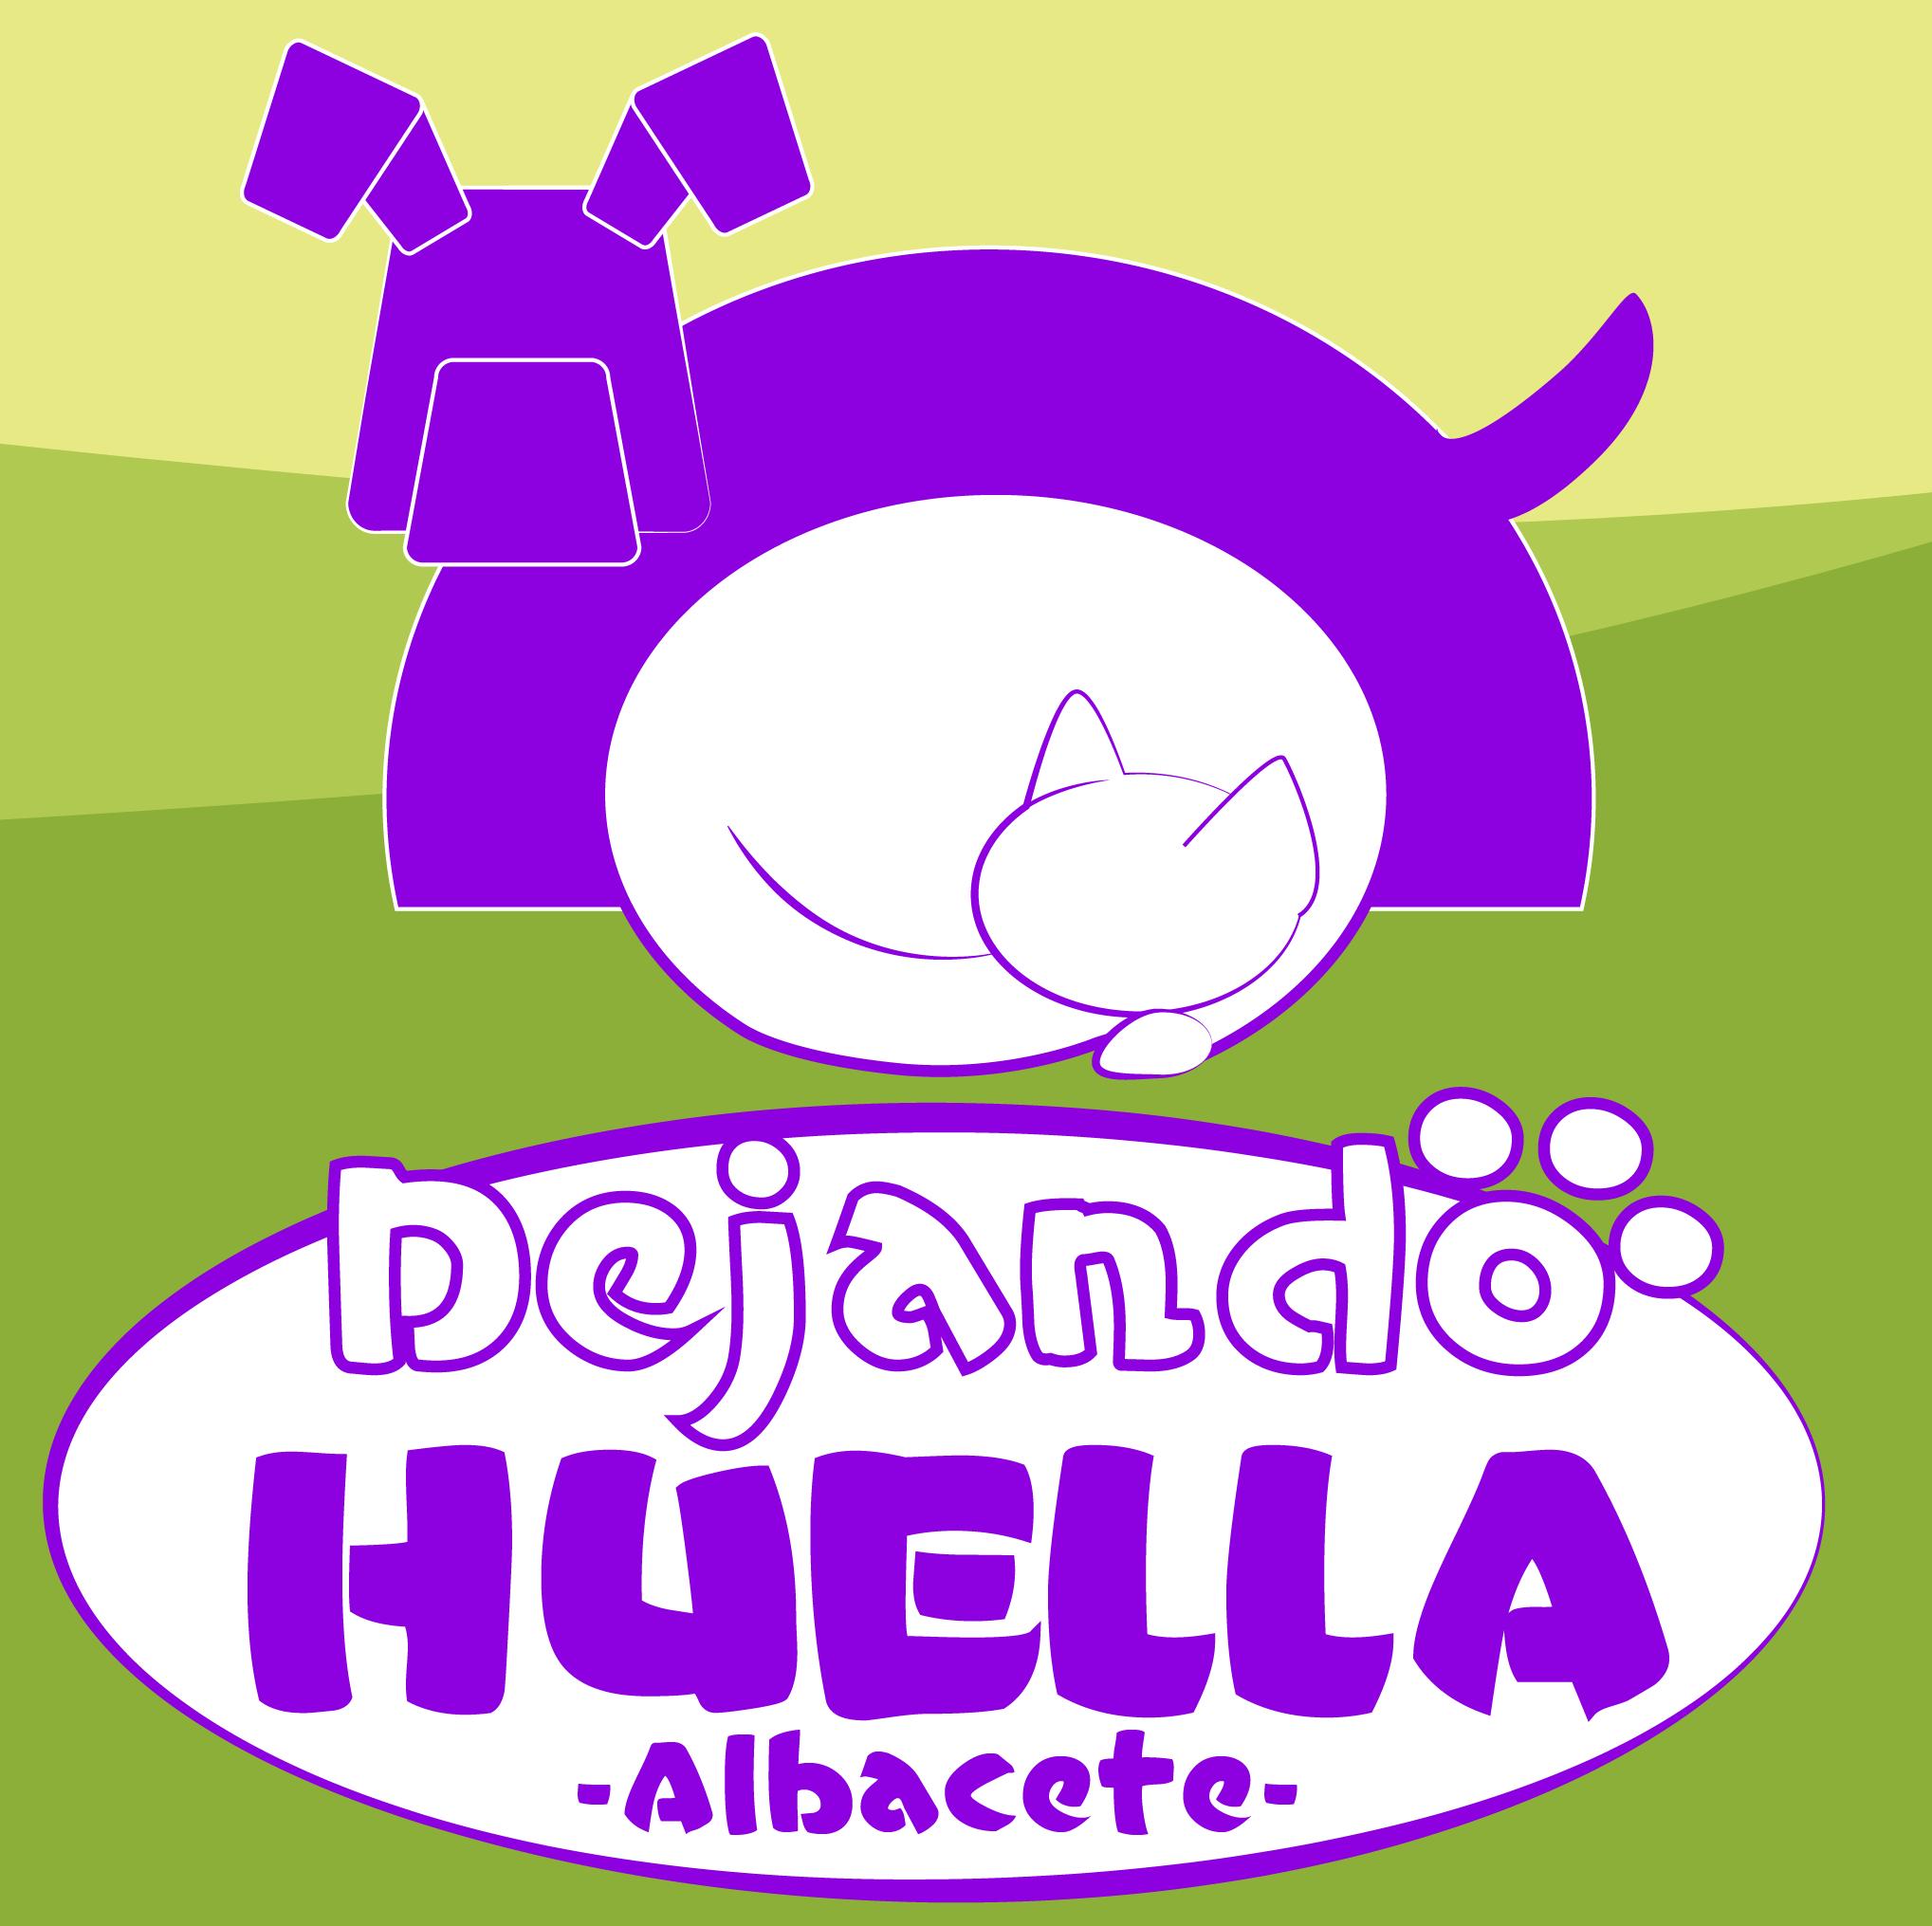 DEJANDO HUELLA - ALBACETE - LOGO